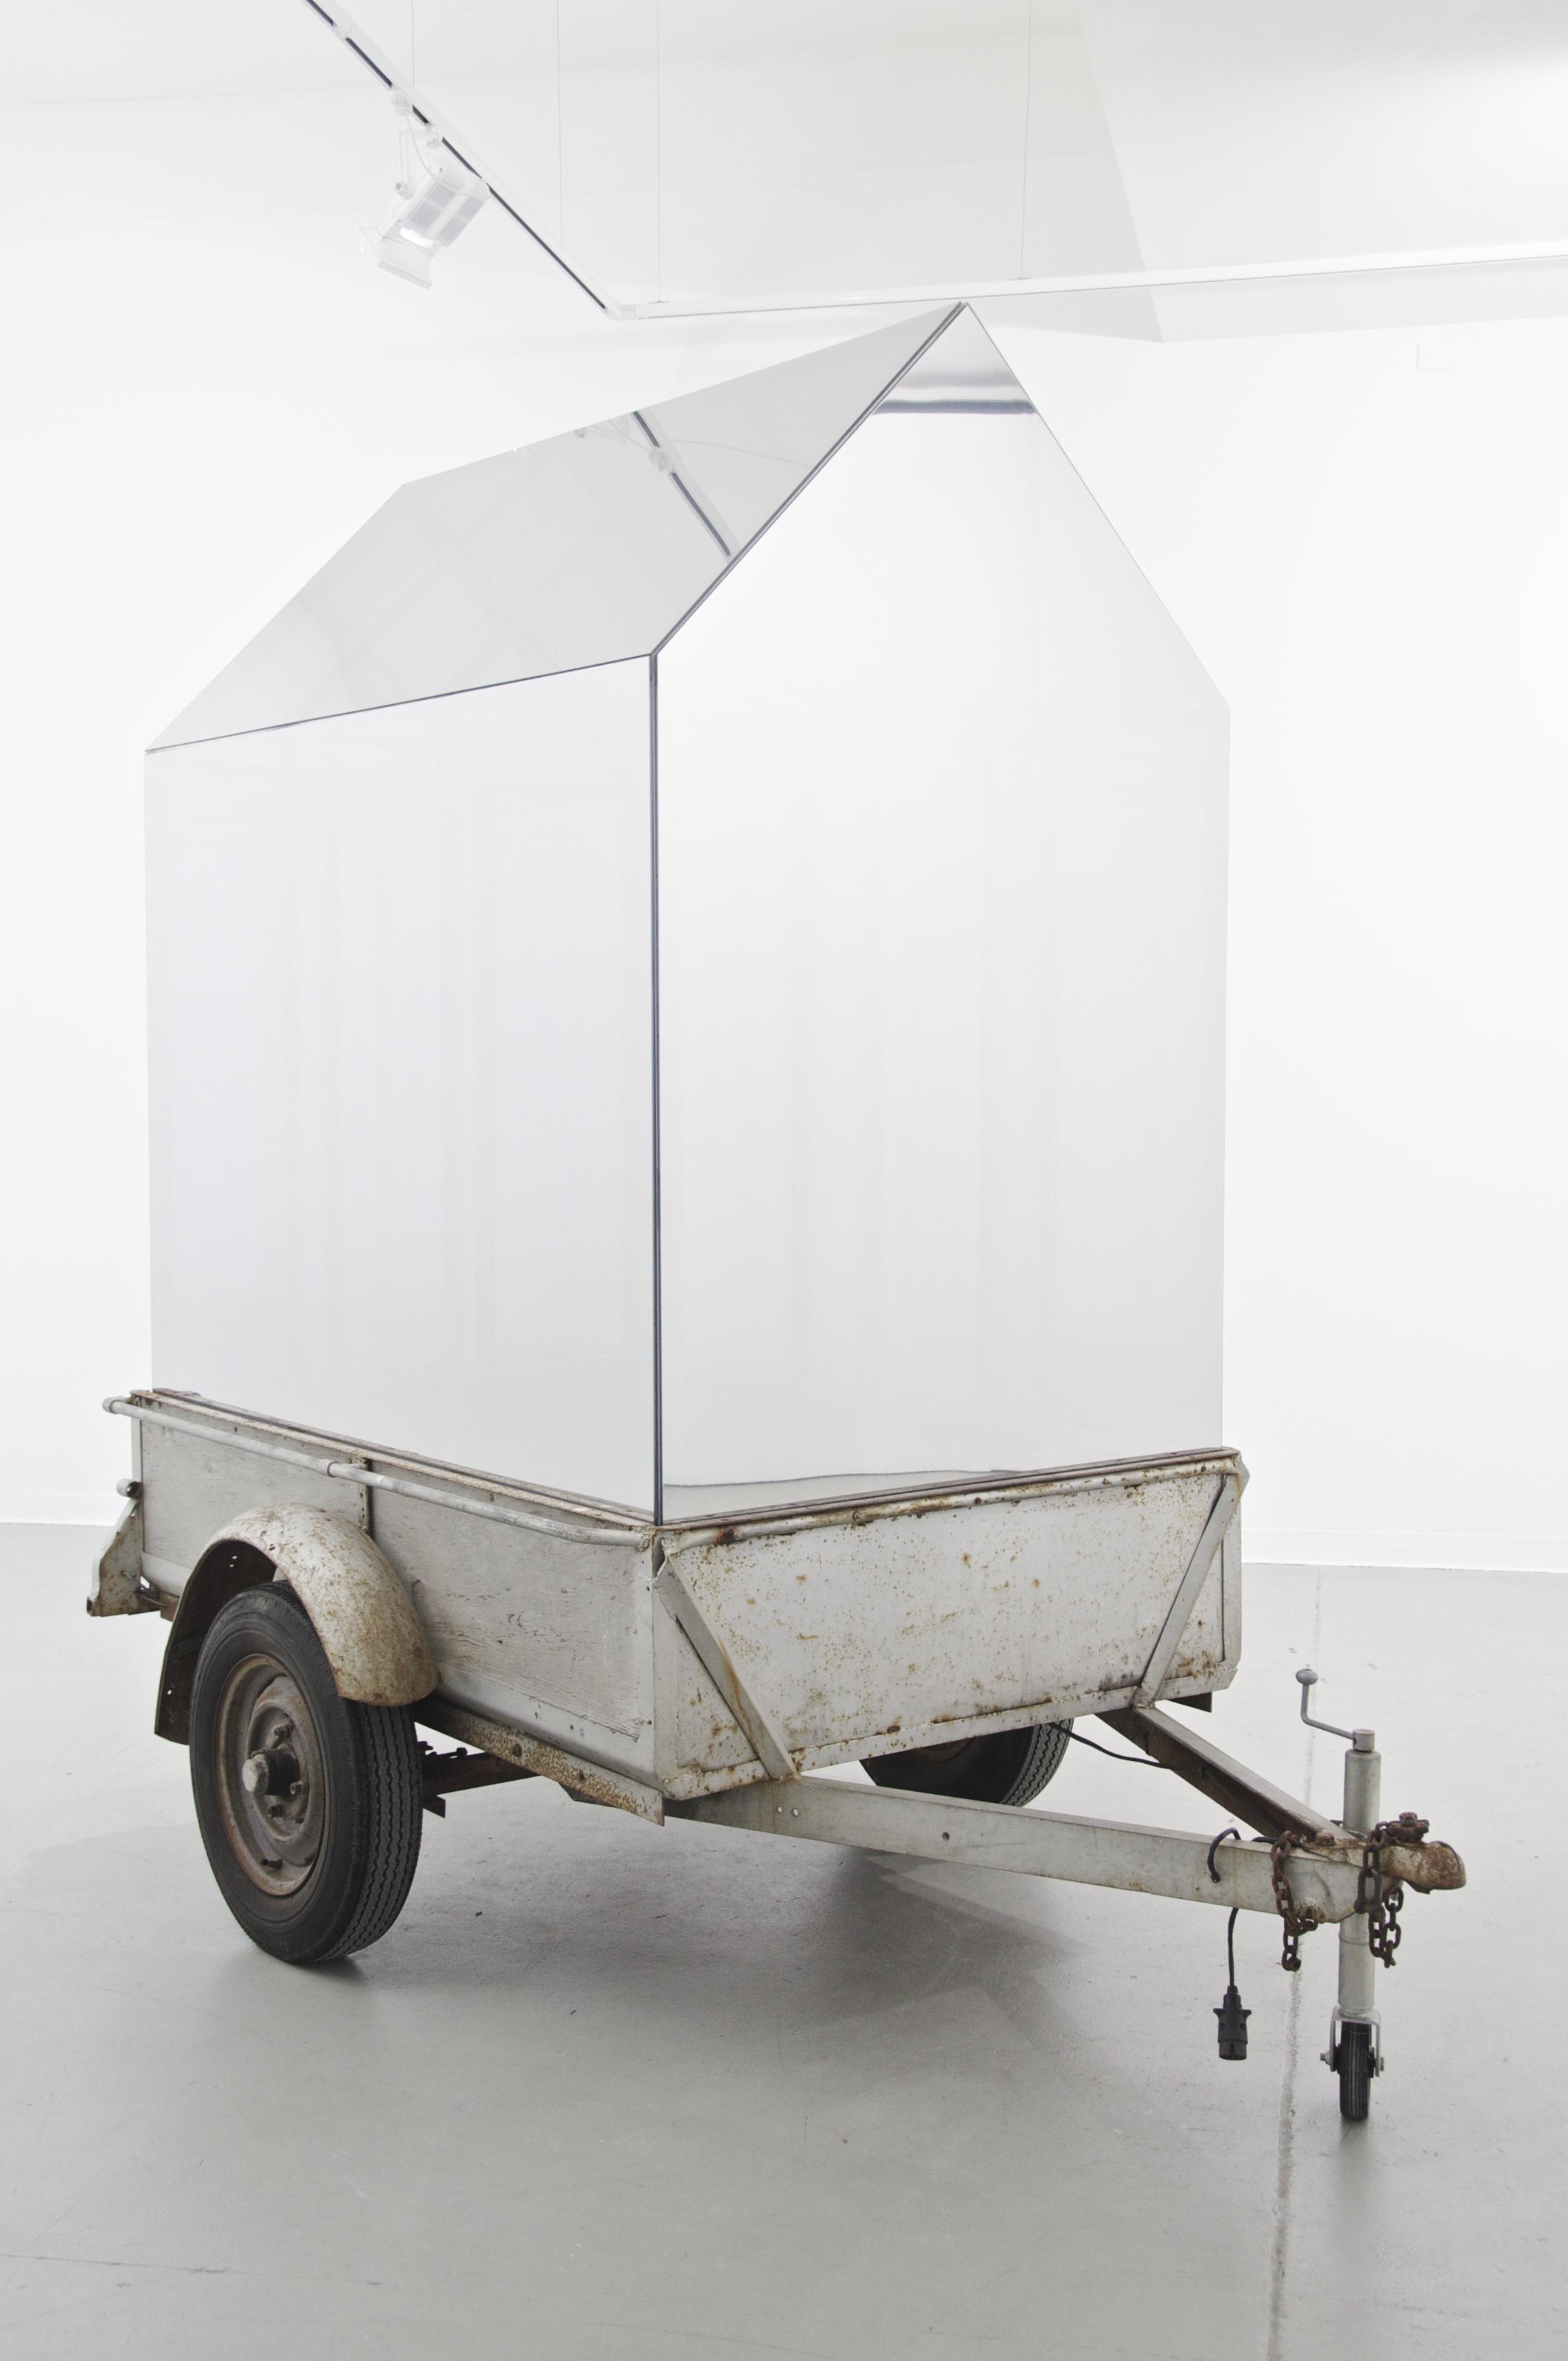 Matt Huppatz,  Go West!  2013-15. Found home-made trailer, acrylic, reflective film, aluminium. Photo by Alex Lofting. Courtesy of the artist.